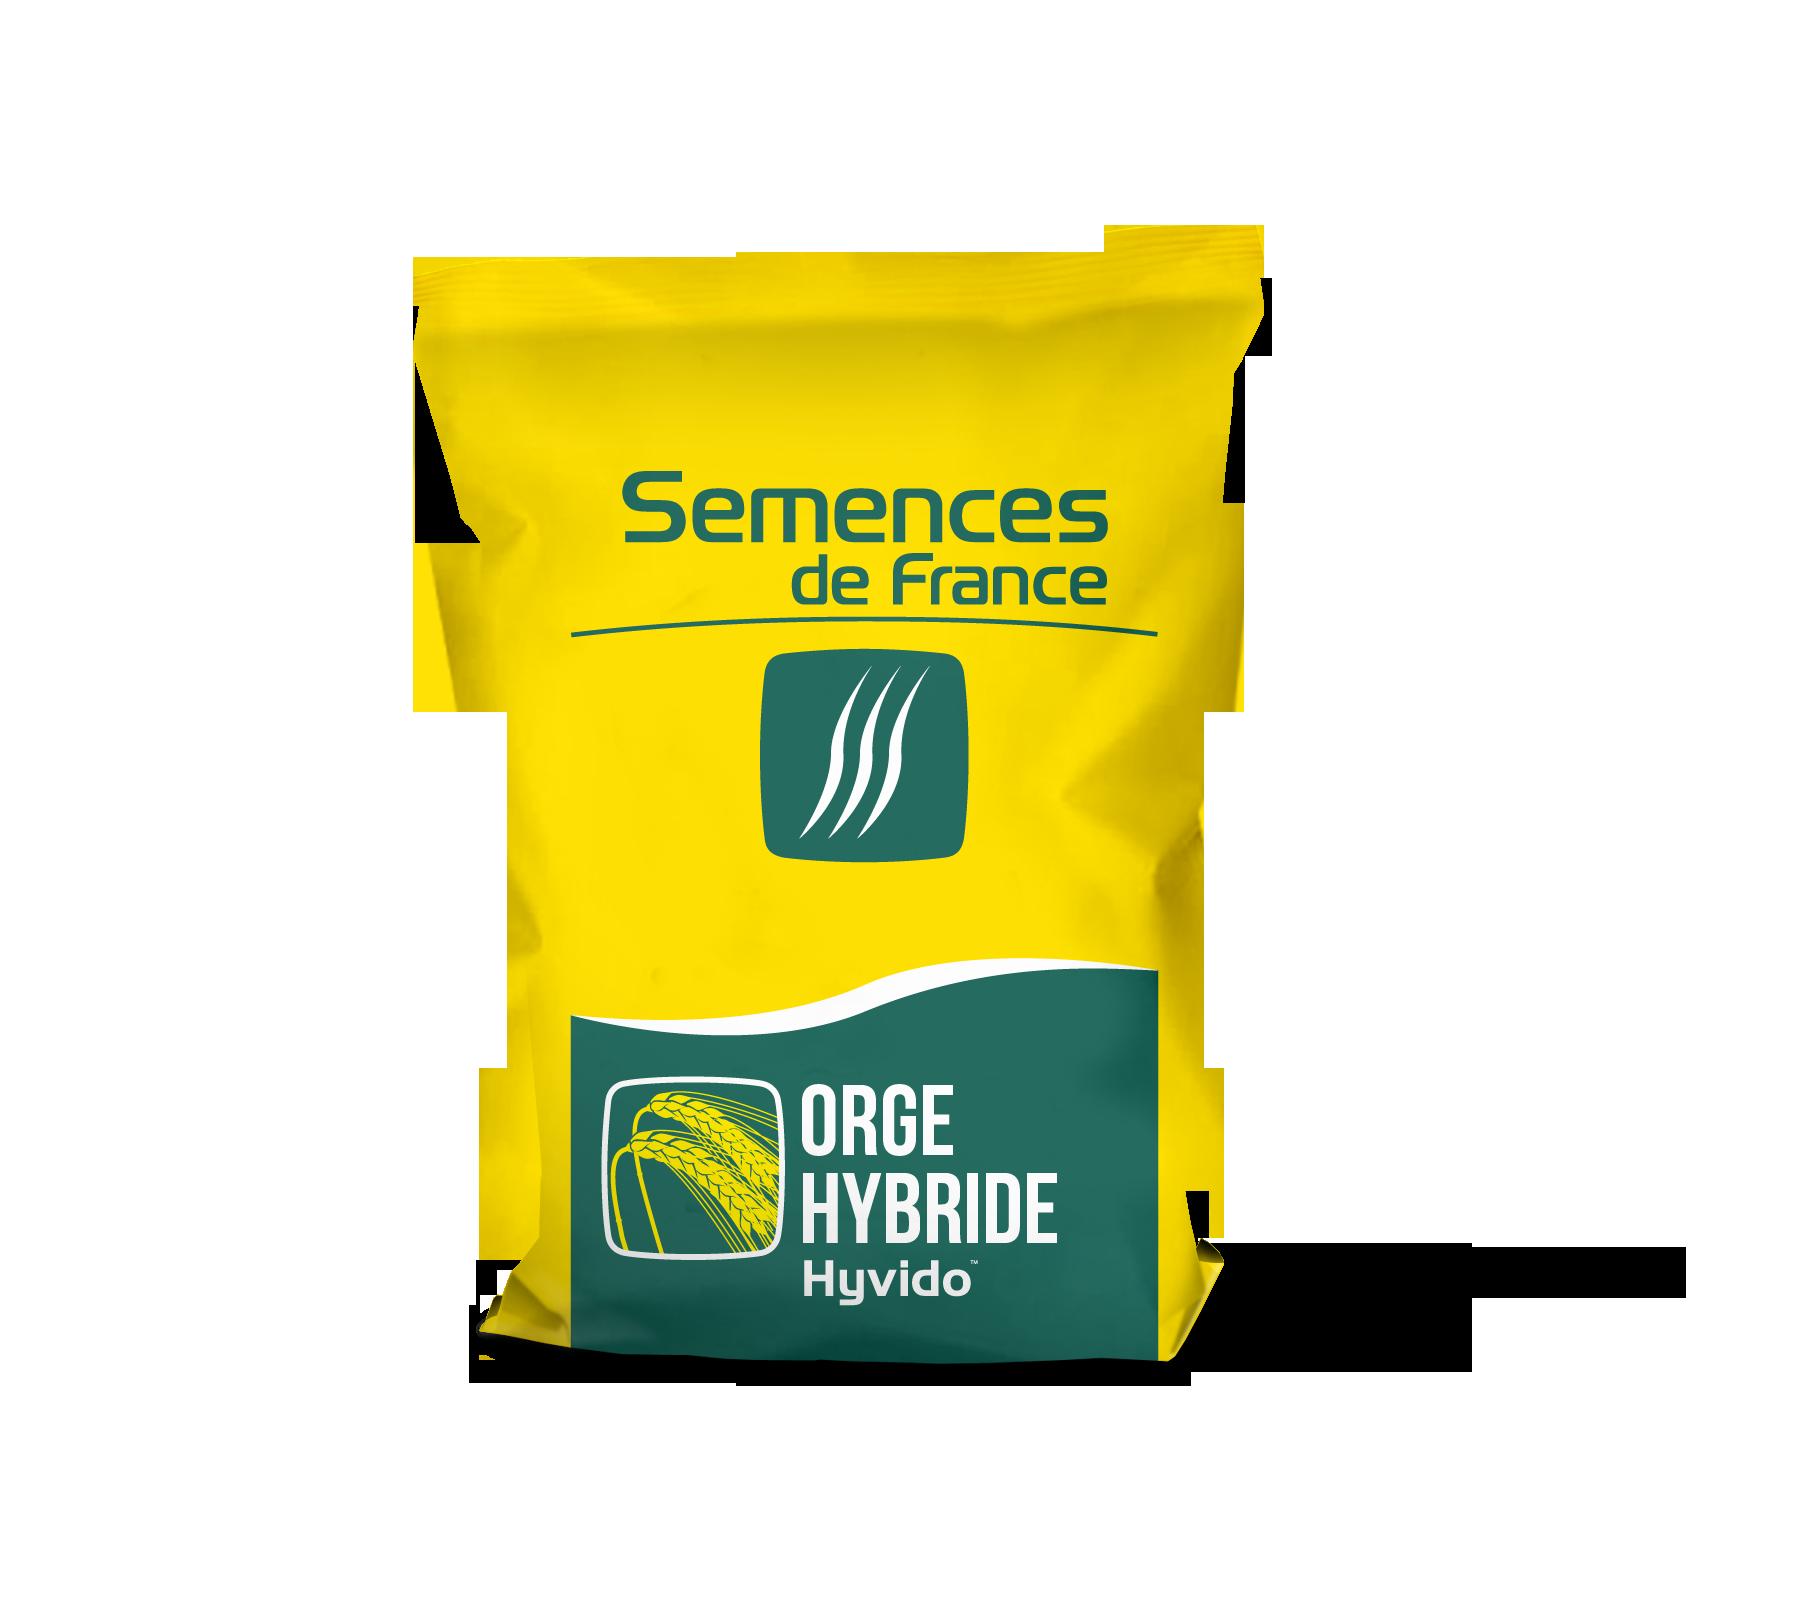 sac orge hybride